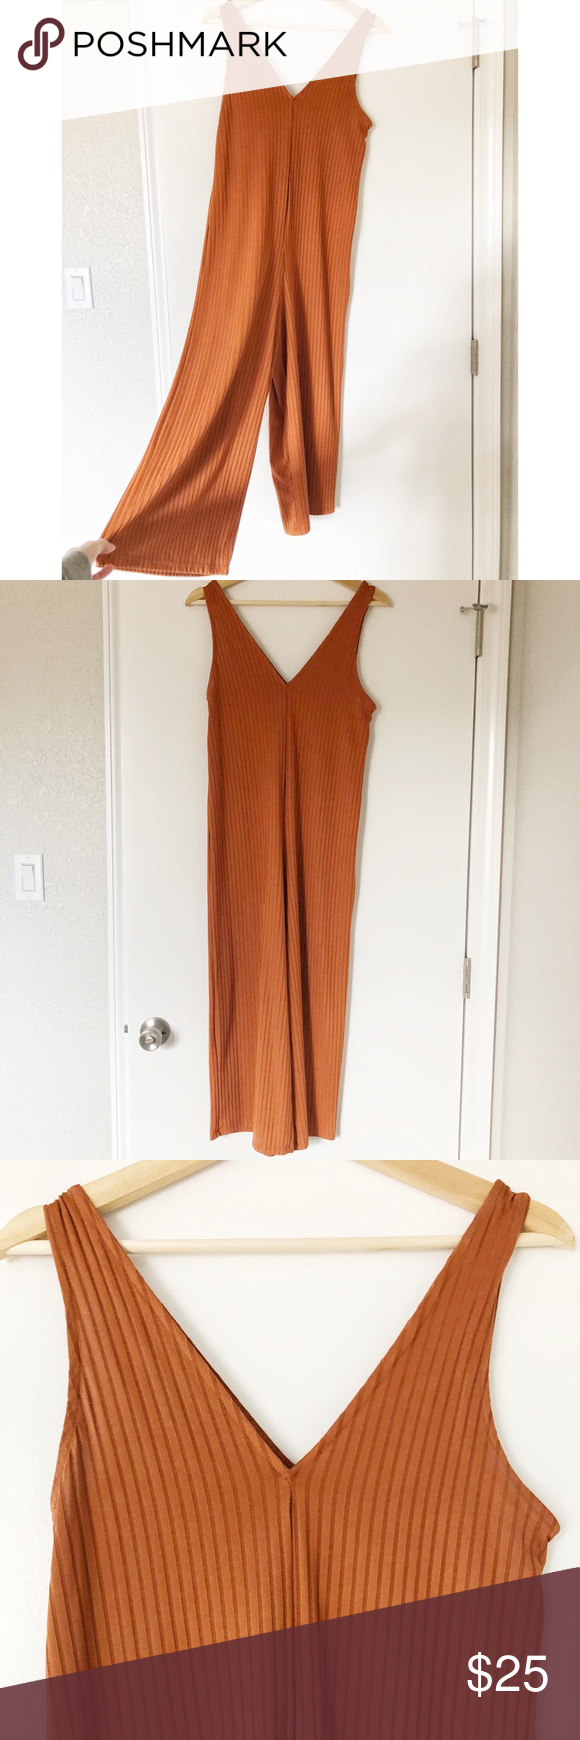 9089841e99e ZARA Orange Jumpsuit Burnt orange jumpsuit Great Pre-Owned Condition Zara  Other